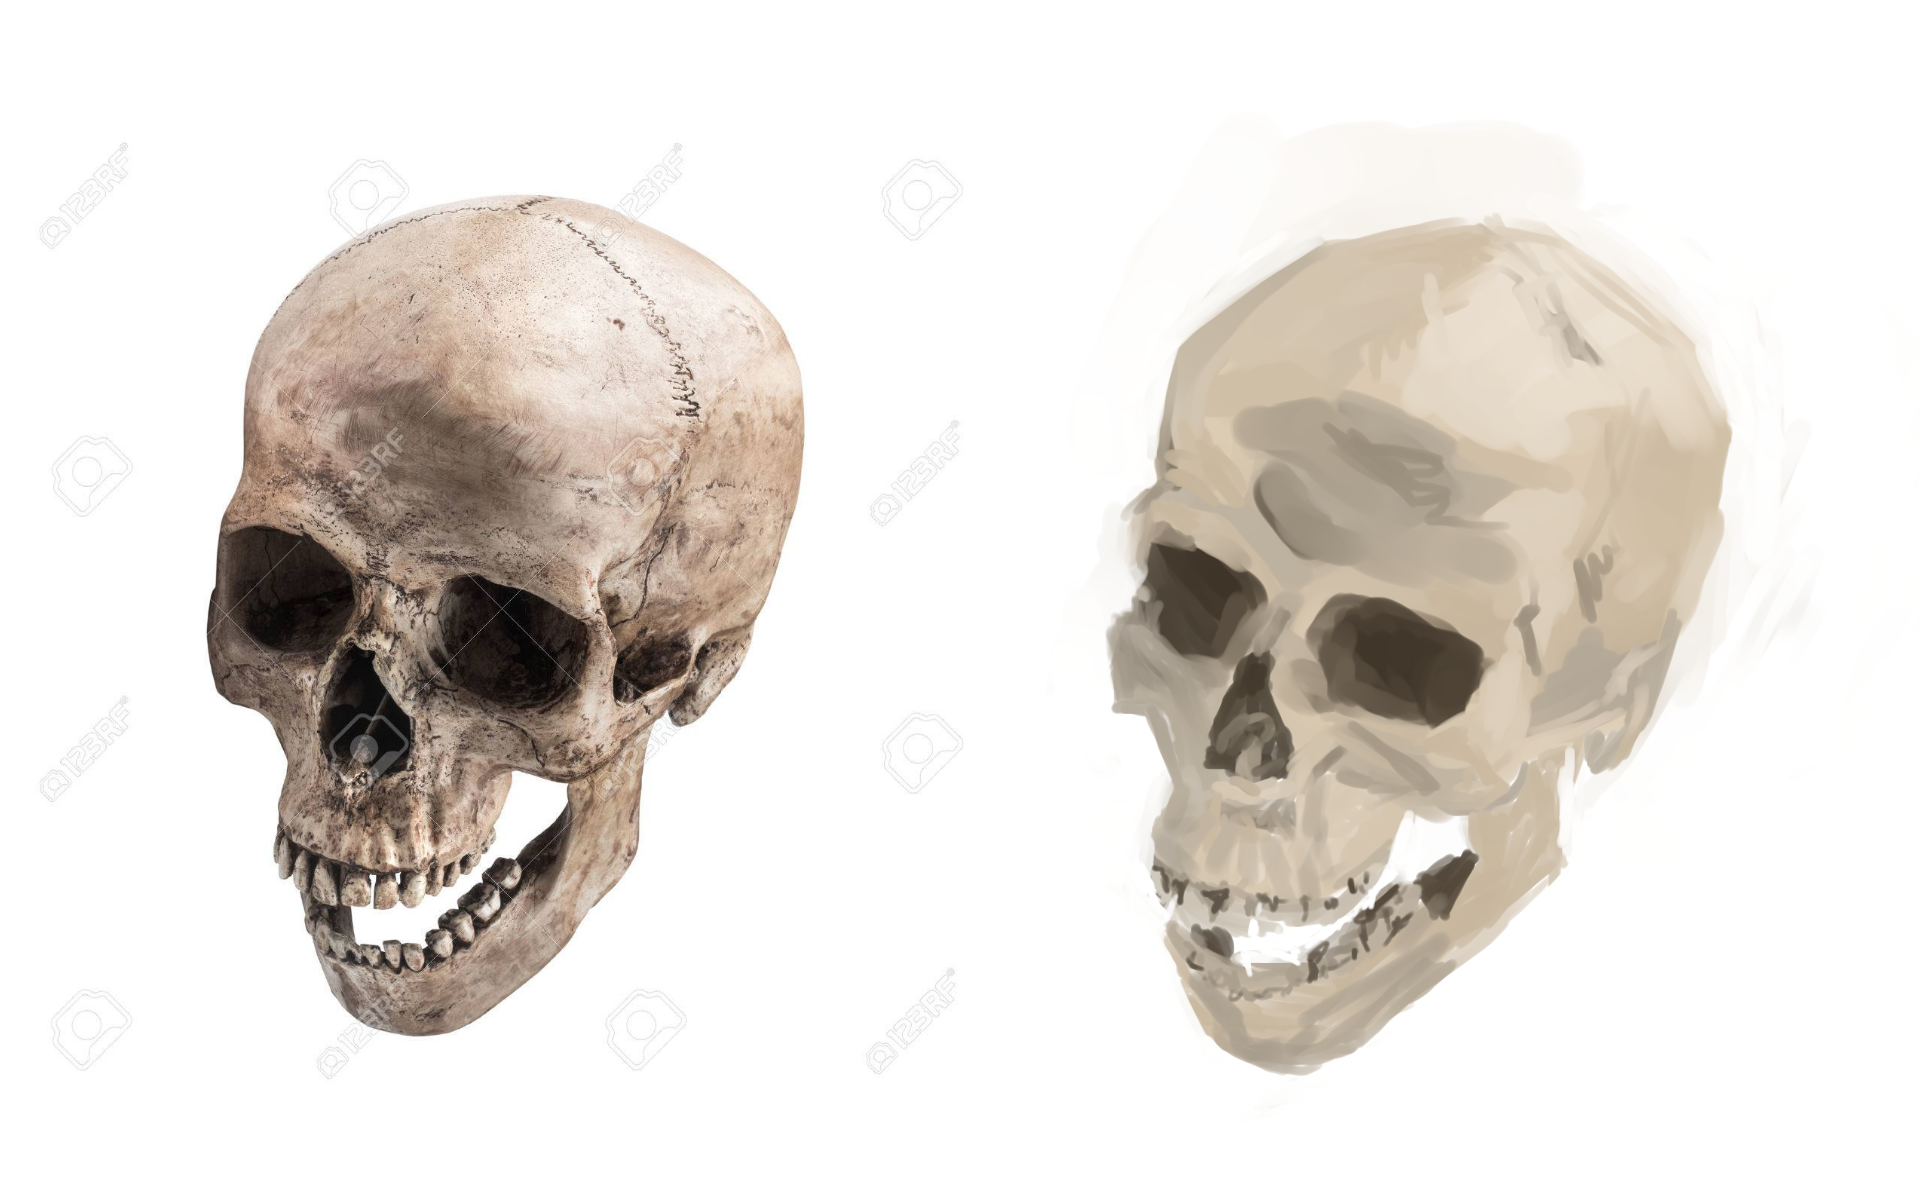 [Image: skullstudy1.png]